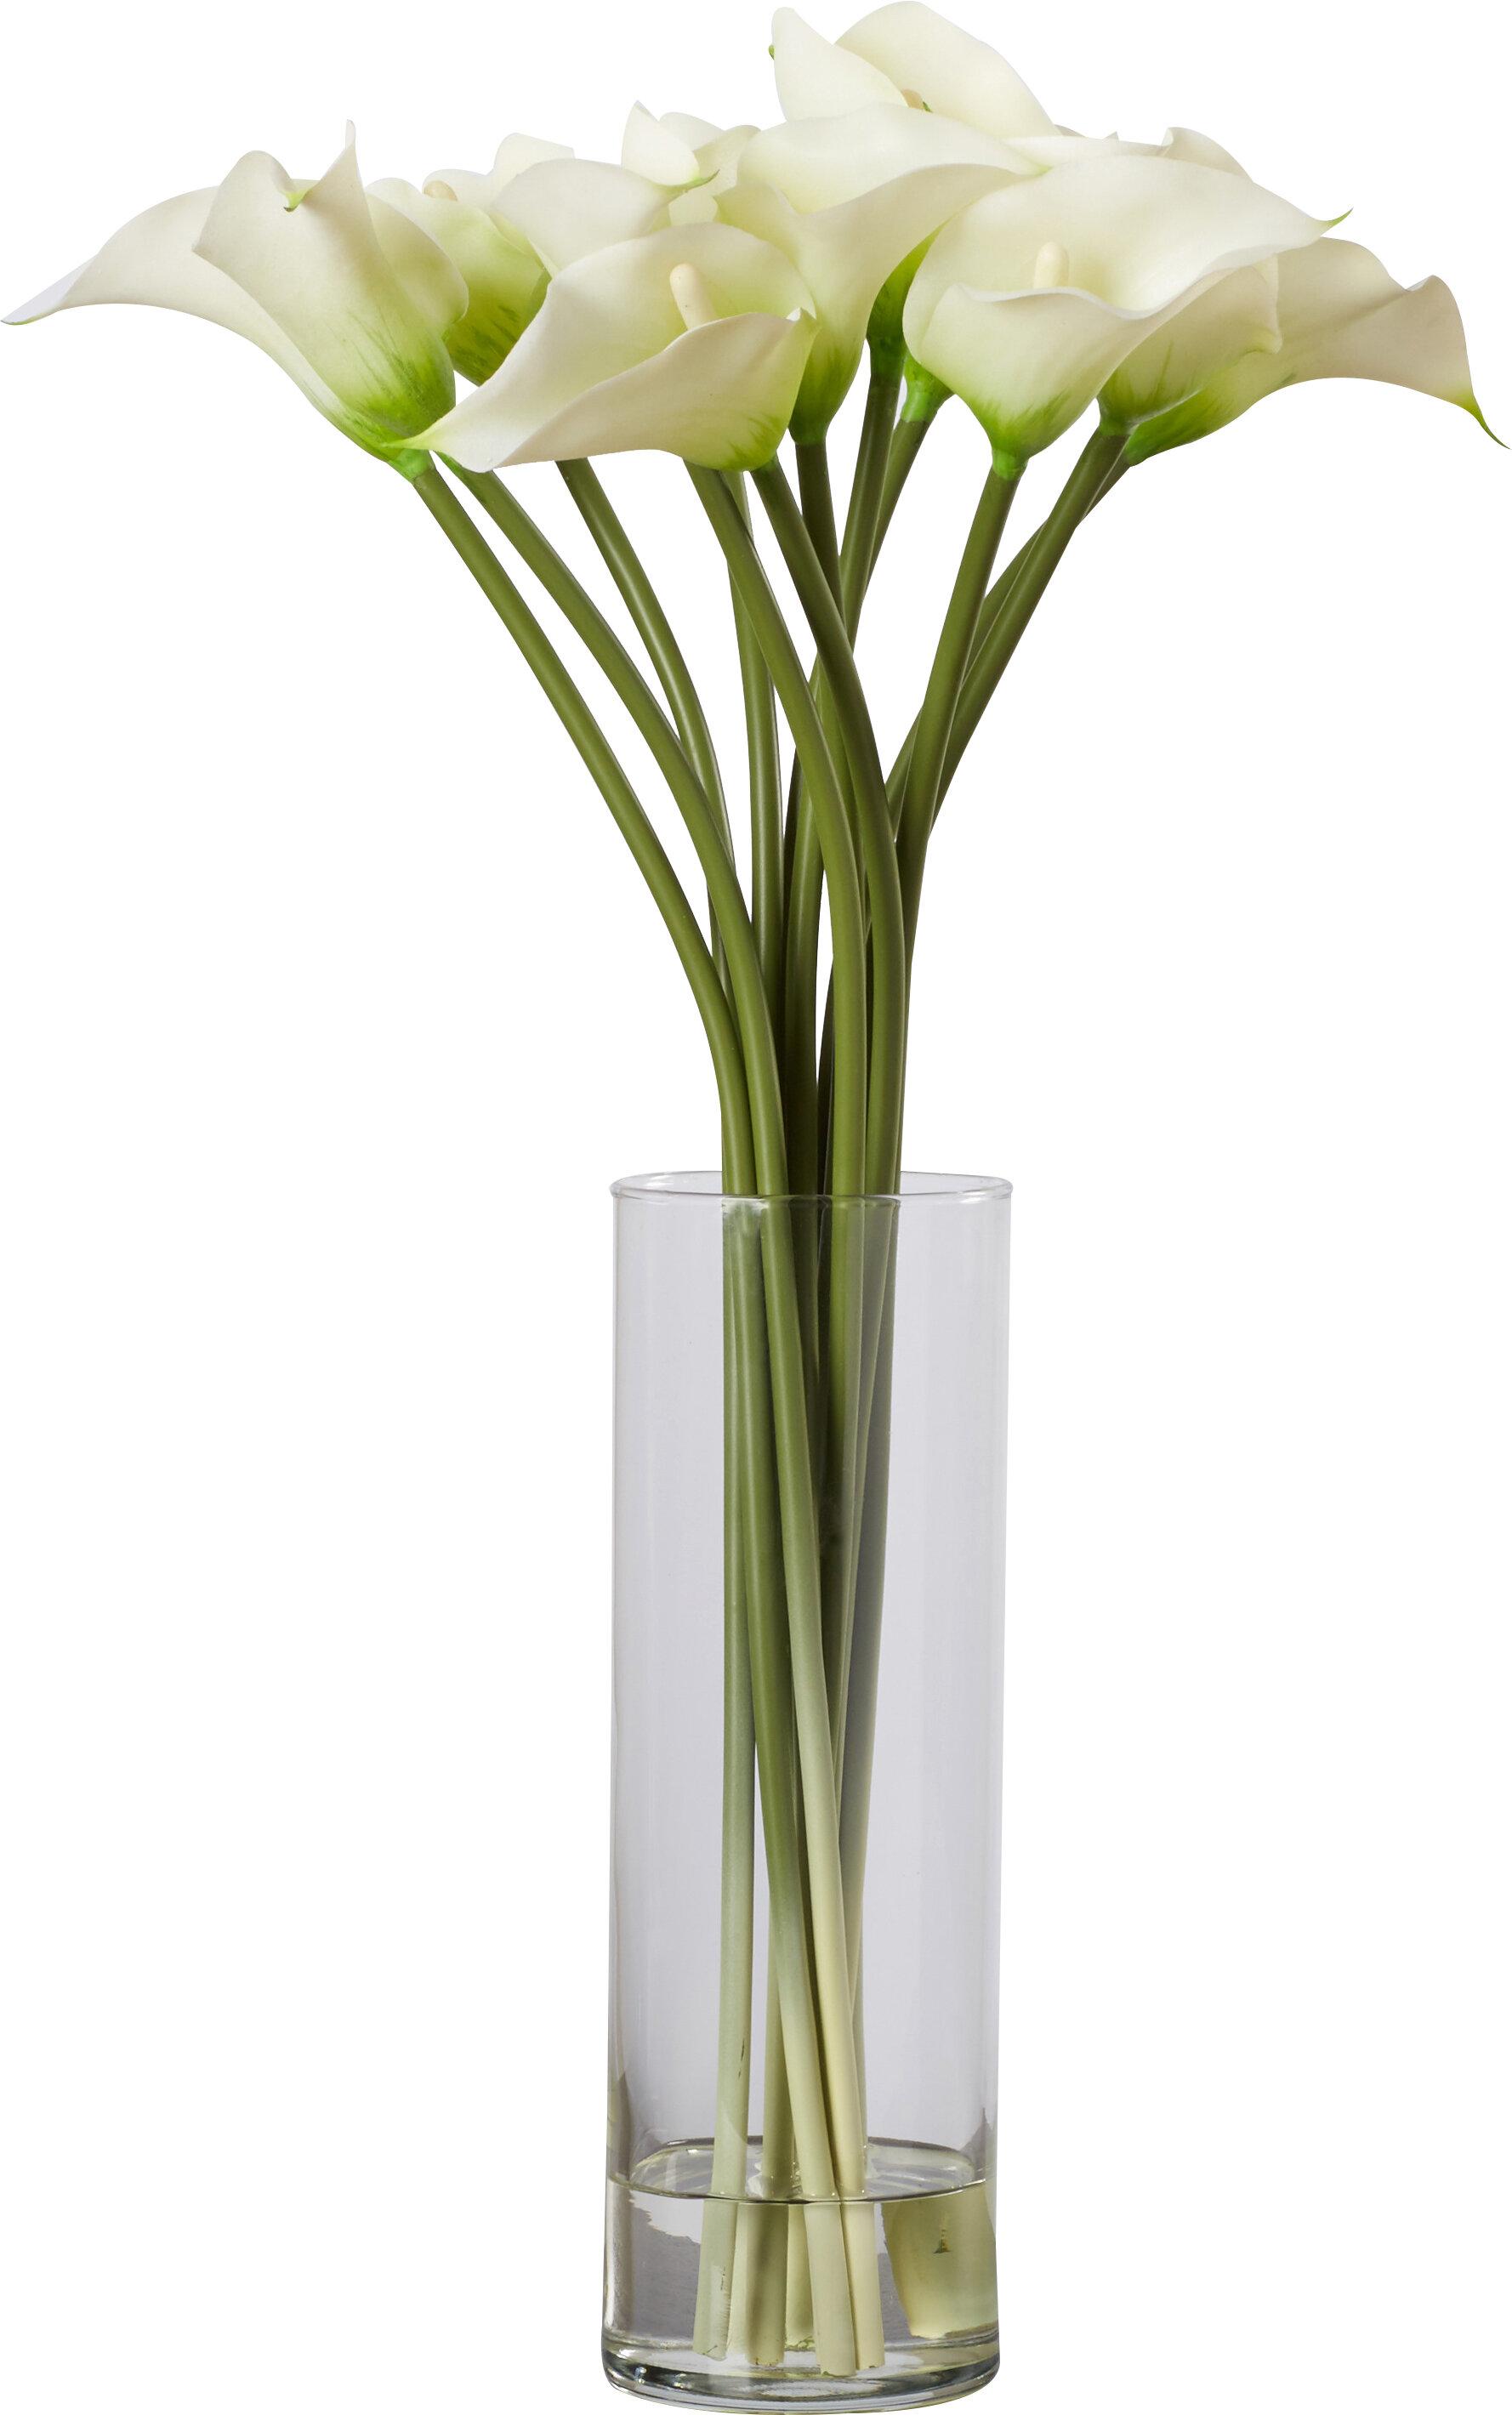 sc 1 st  Joss \u0026 Main & Calla Lily Flower Arrangement in Flower Vase \u0026 Reviews | Joss \u0026 Main